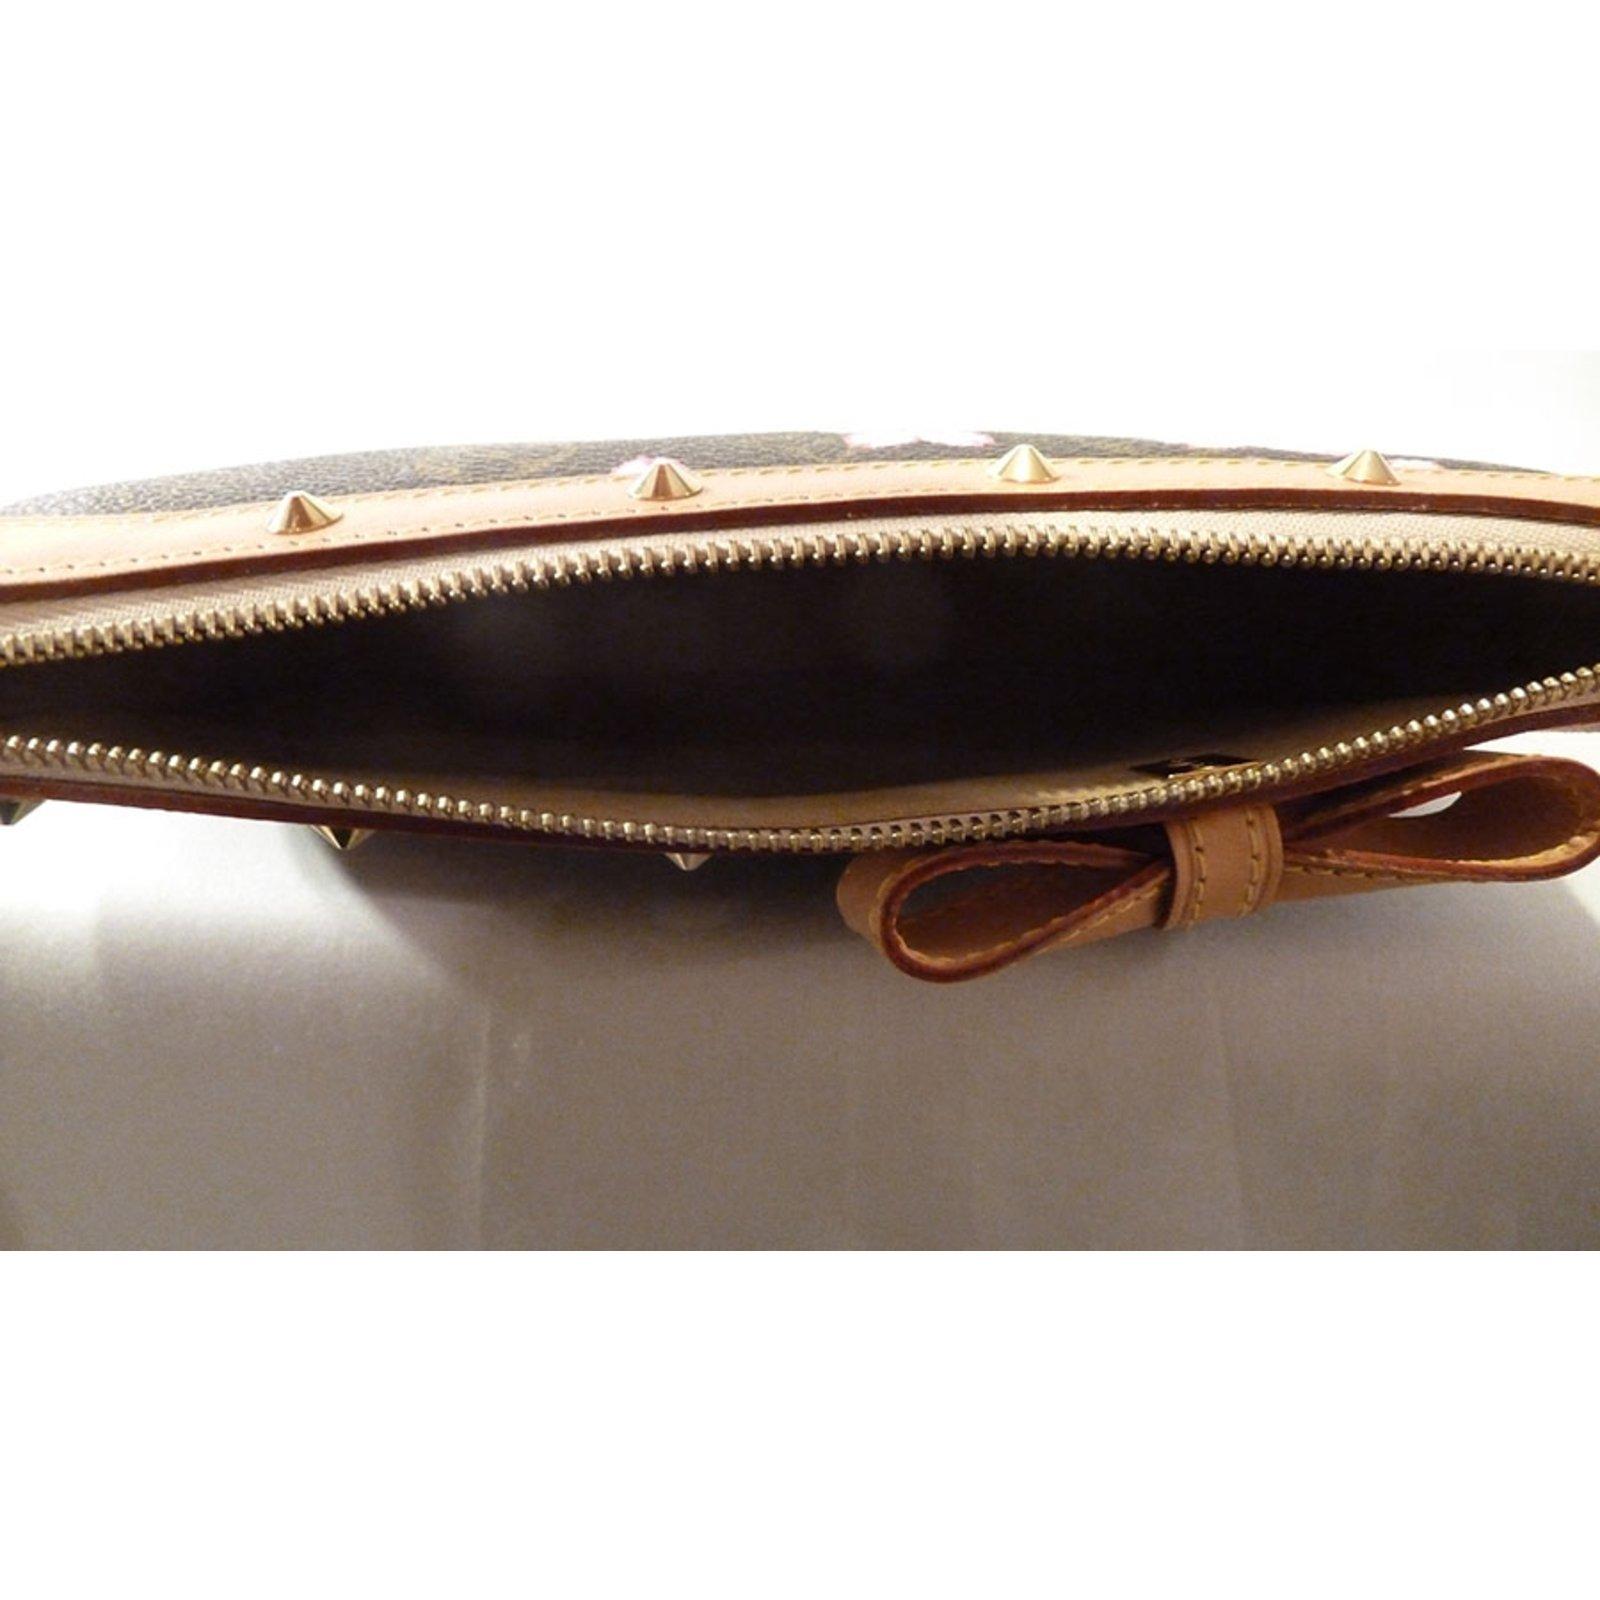 Louis Vuitton Takashi Murakami Cherry Blossom Monogram Stud Pochette  Shoulder Bag Handbags Other Brown ref.37552 - Joli Closet c747925d60e21